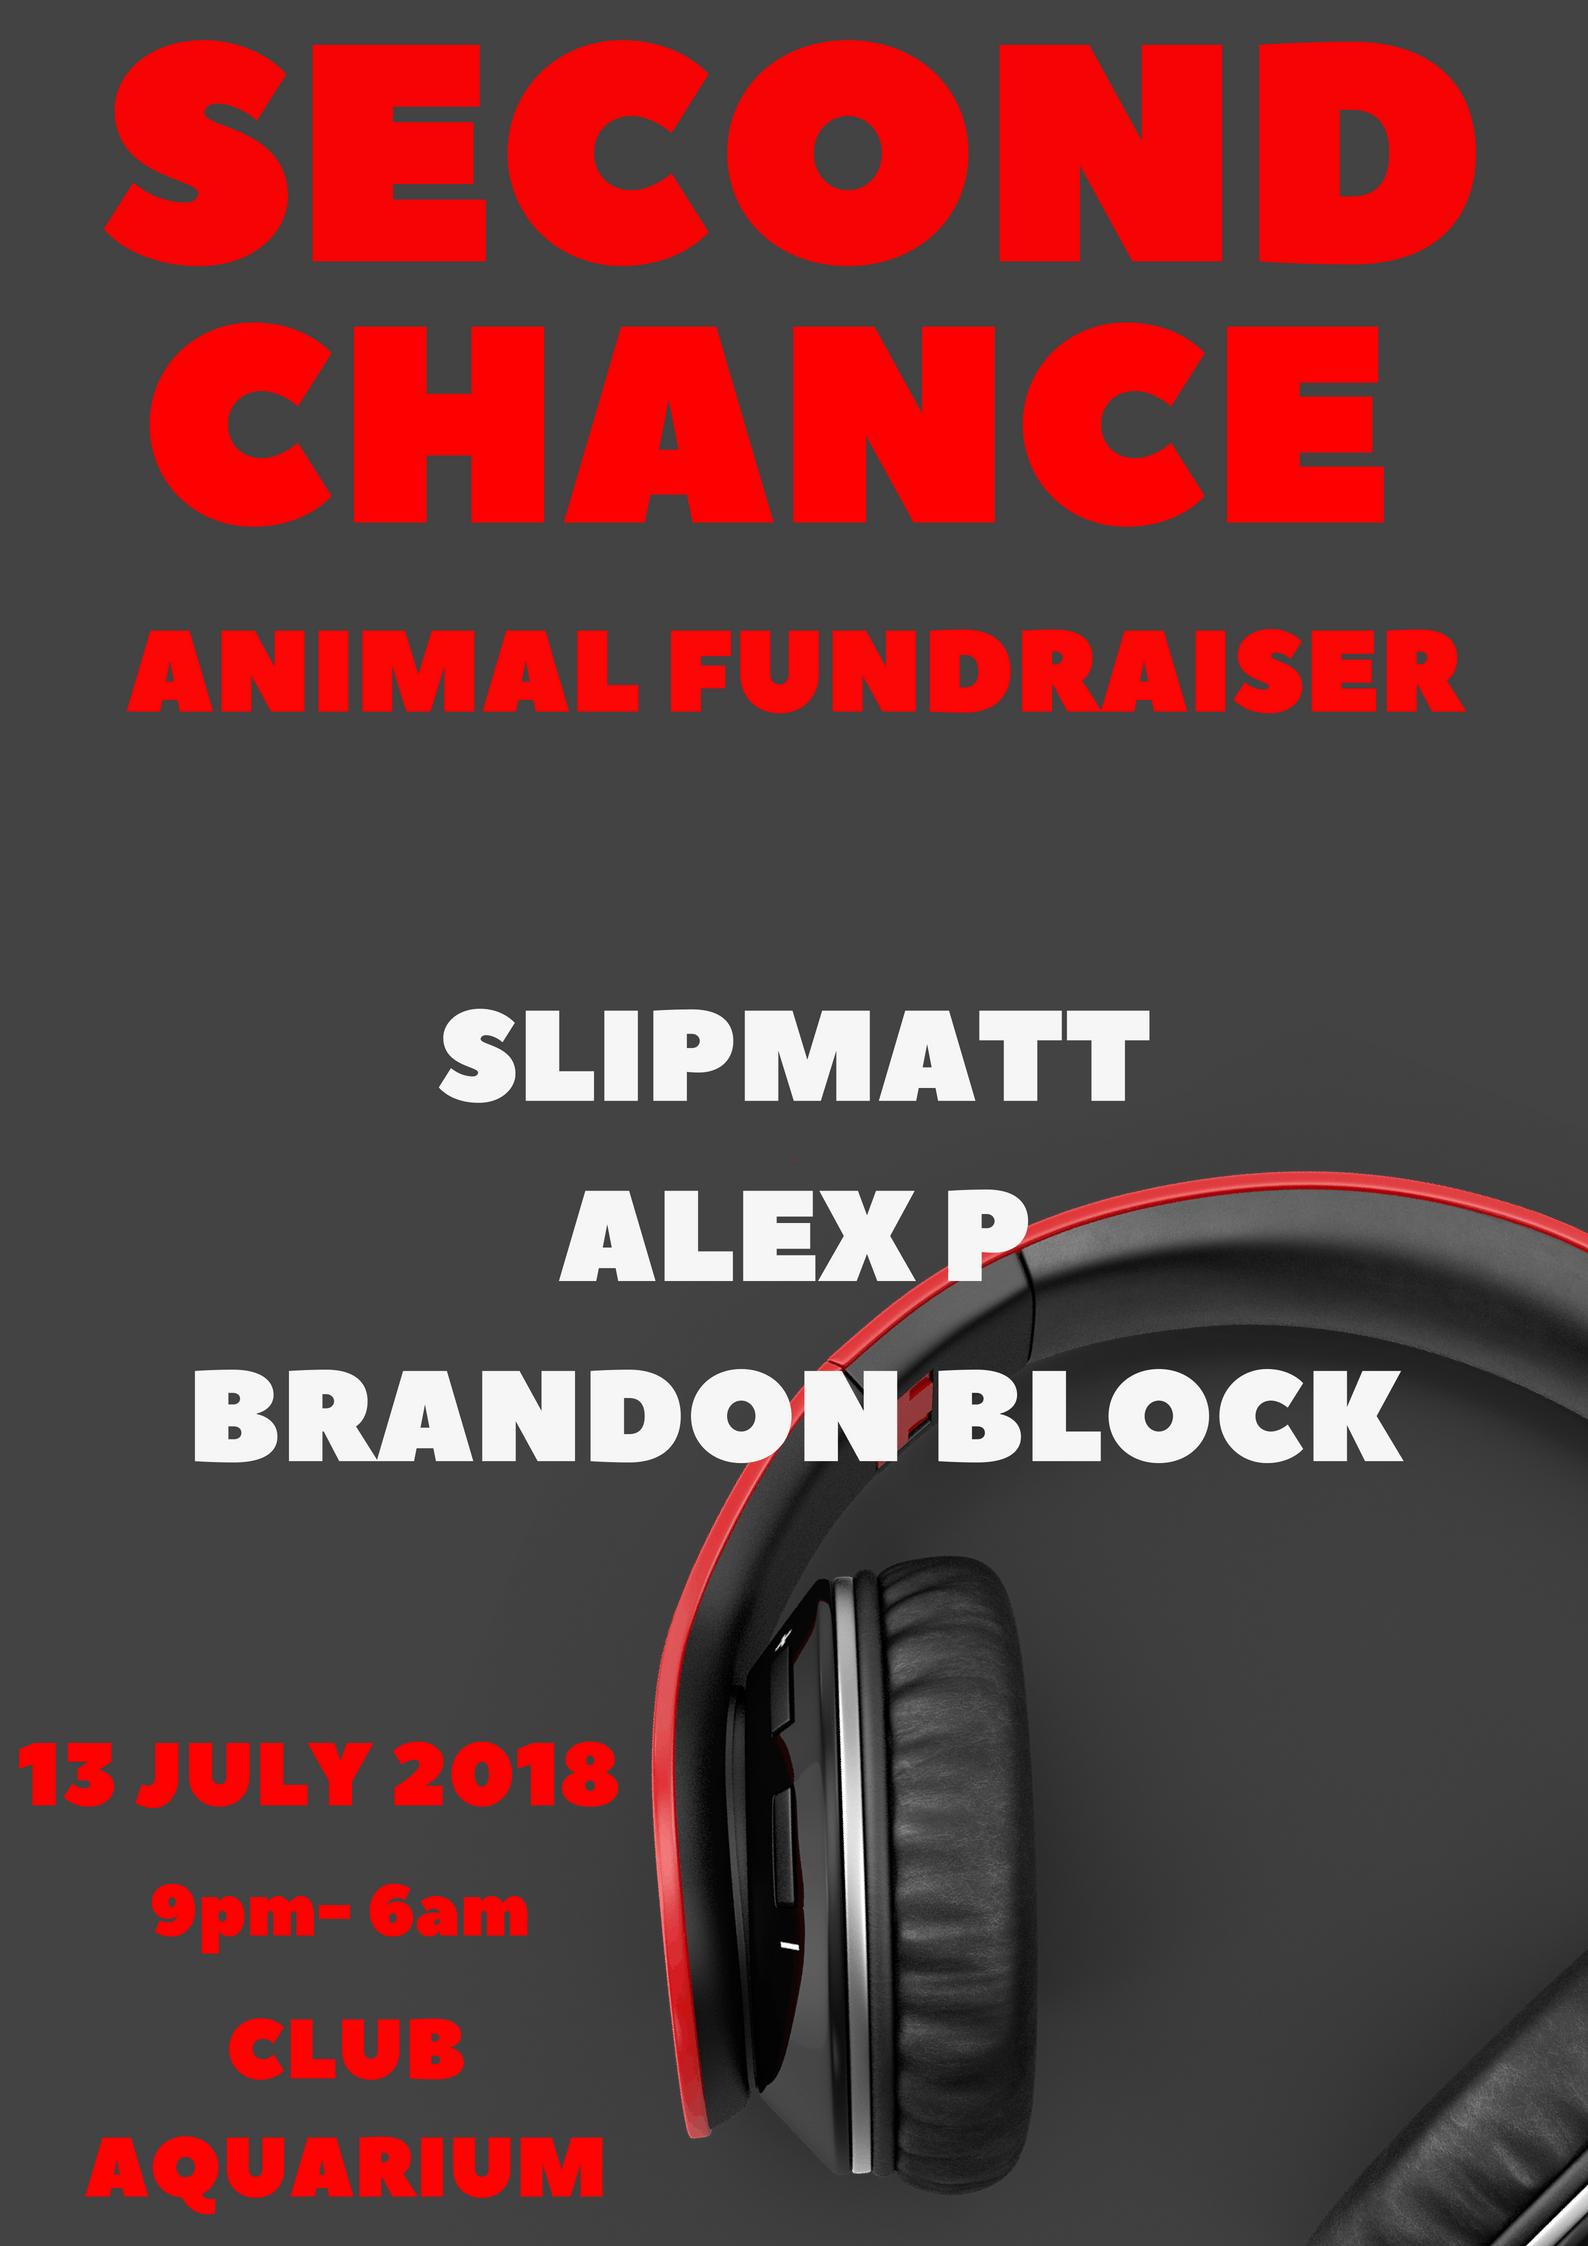 Second Chance Animal Fundraiser